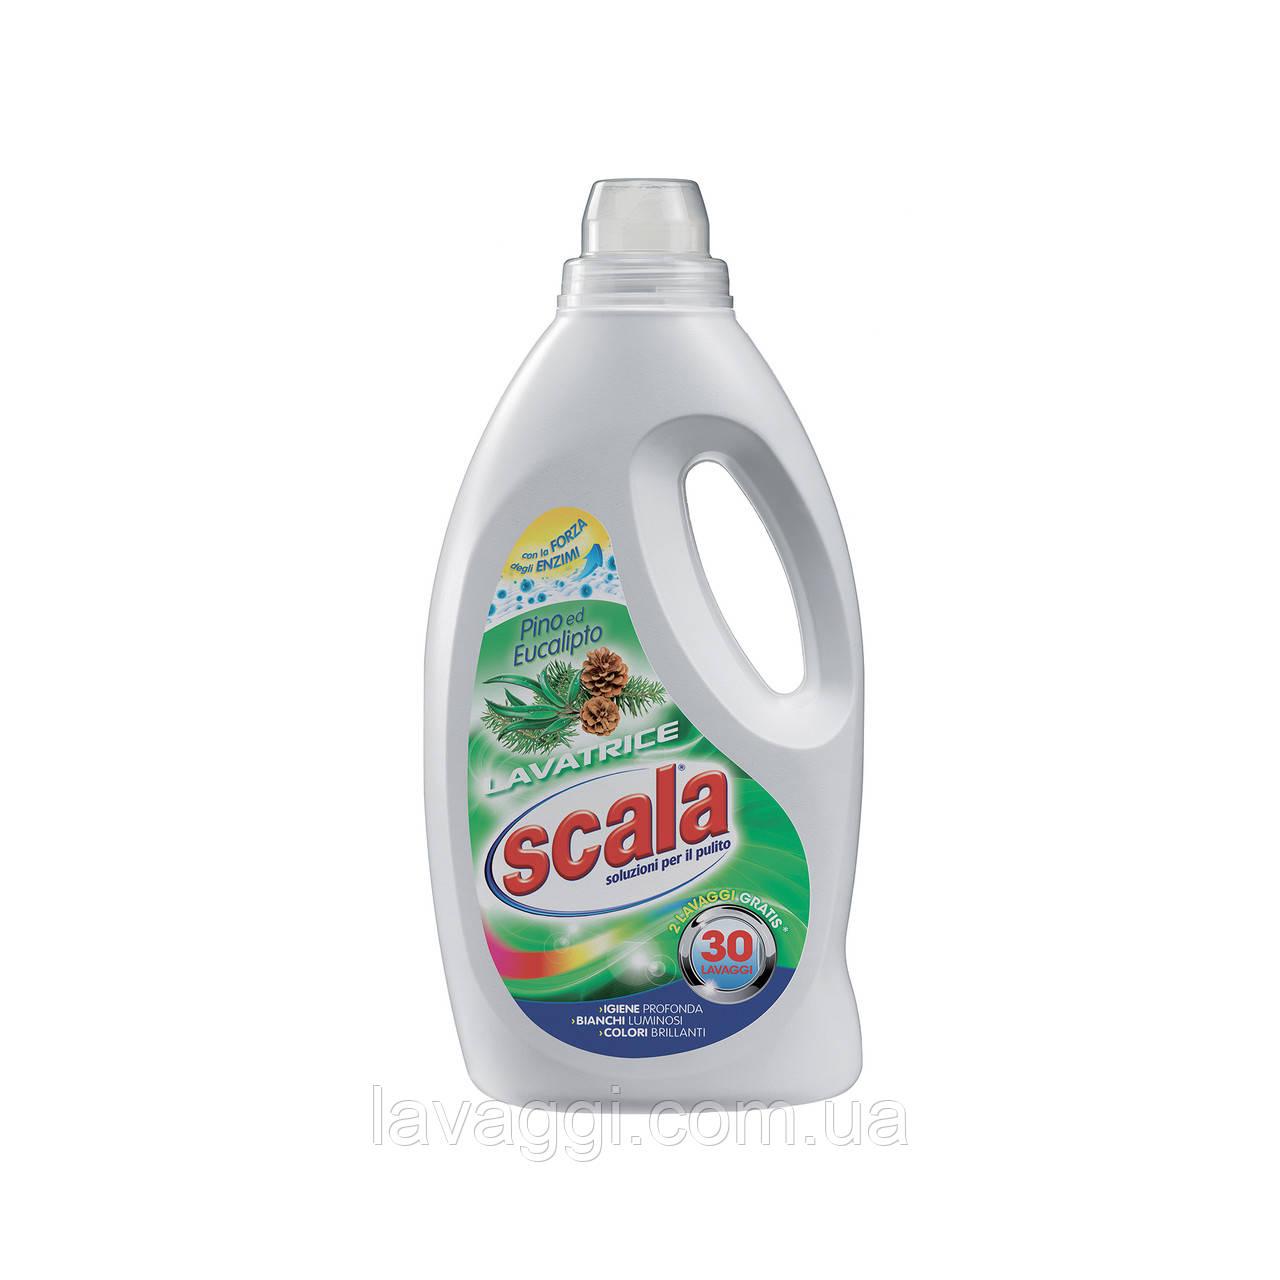 Гель для прання Scala Lavatrice Pino e Eucalipto 1,5 L